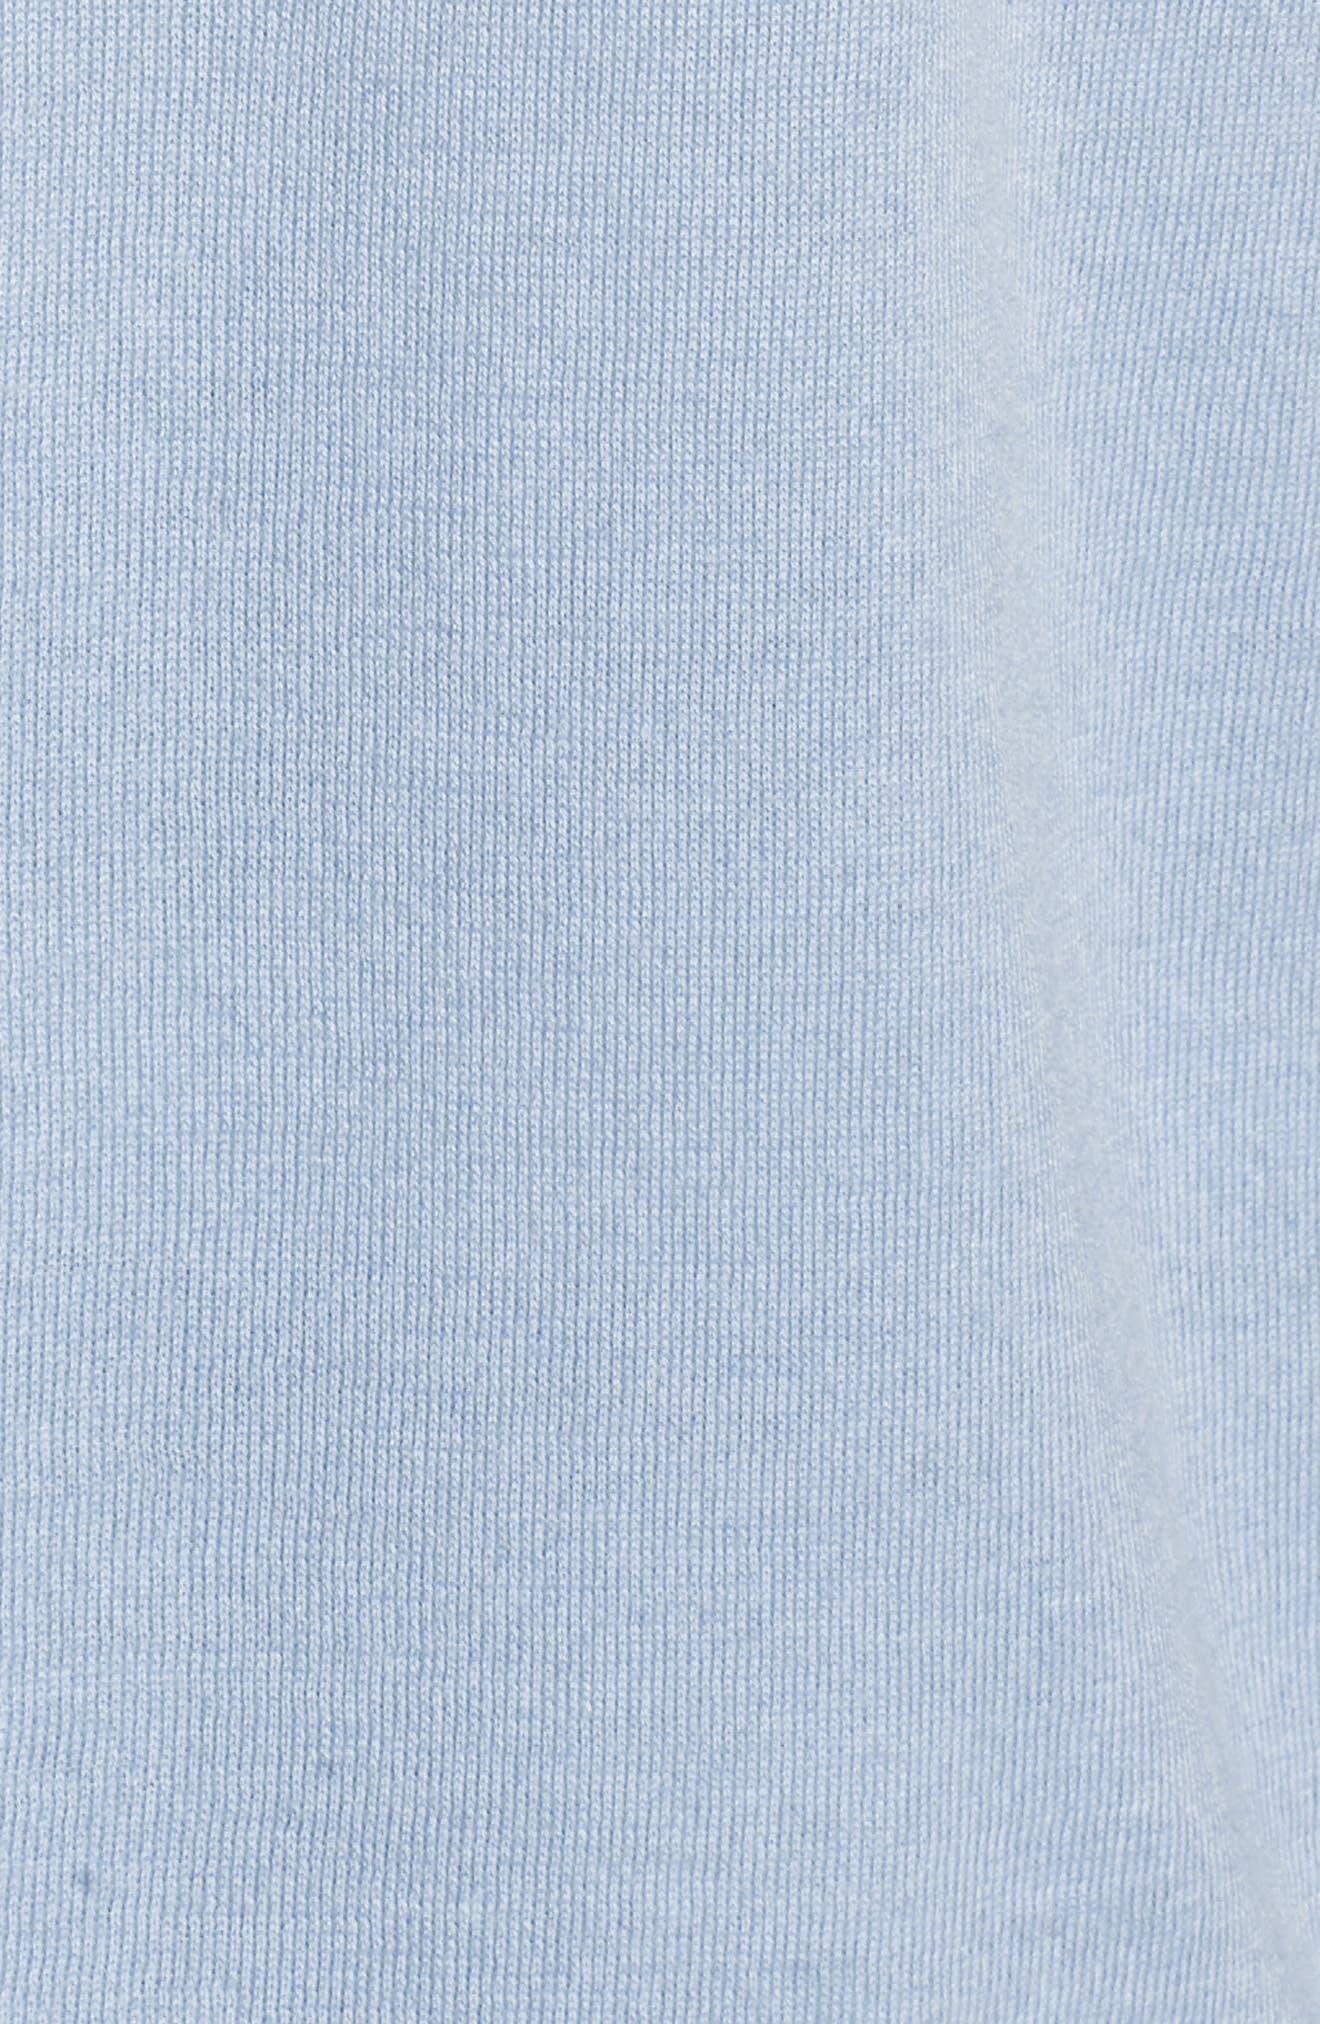 Cashmere Blend Cardigan,                             Alternate thumbnail 6, color,                             450